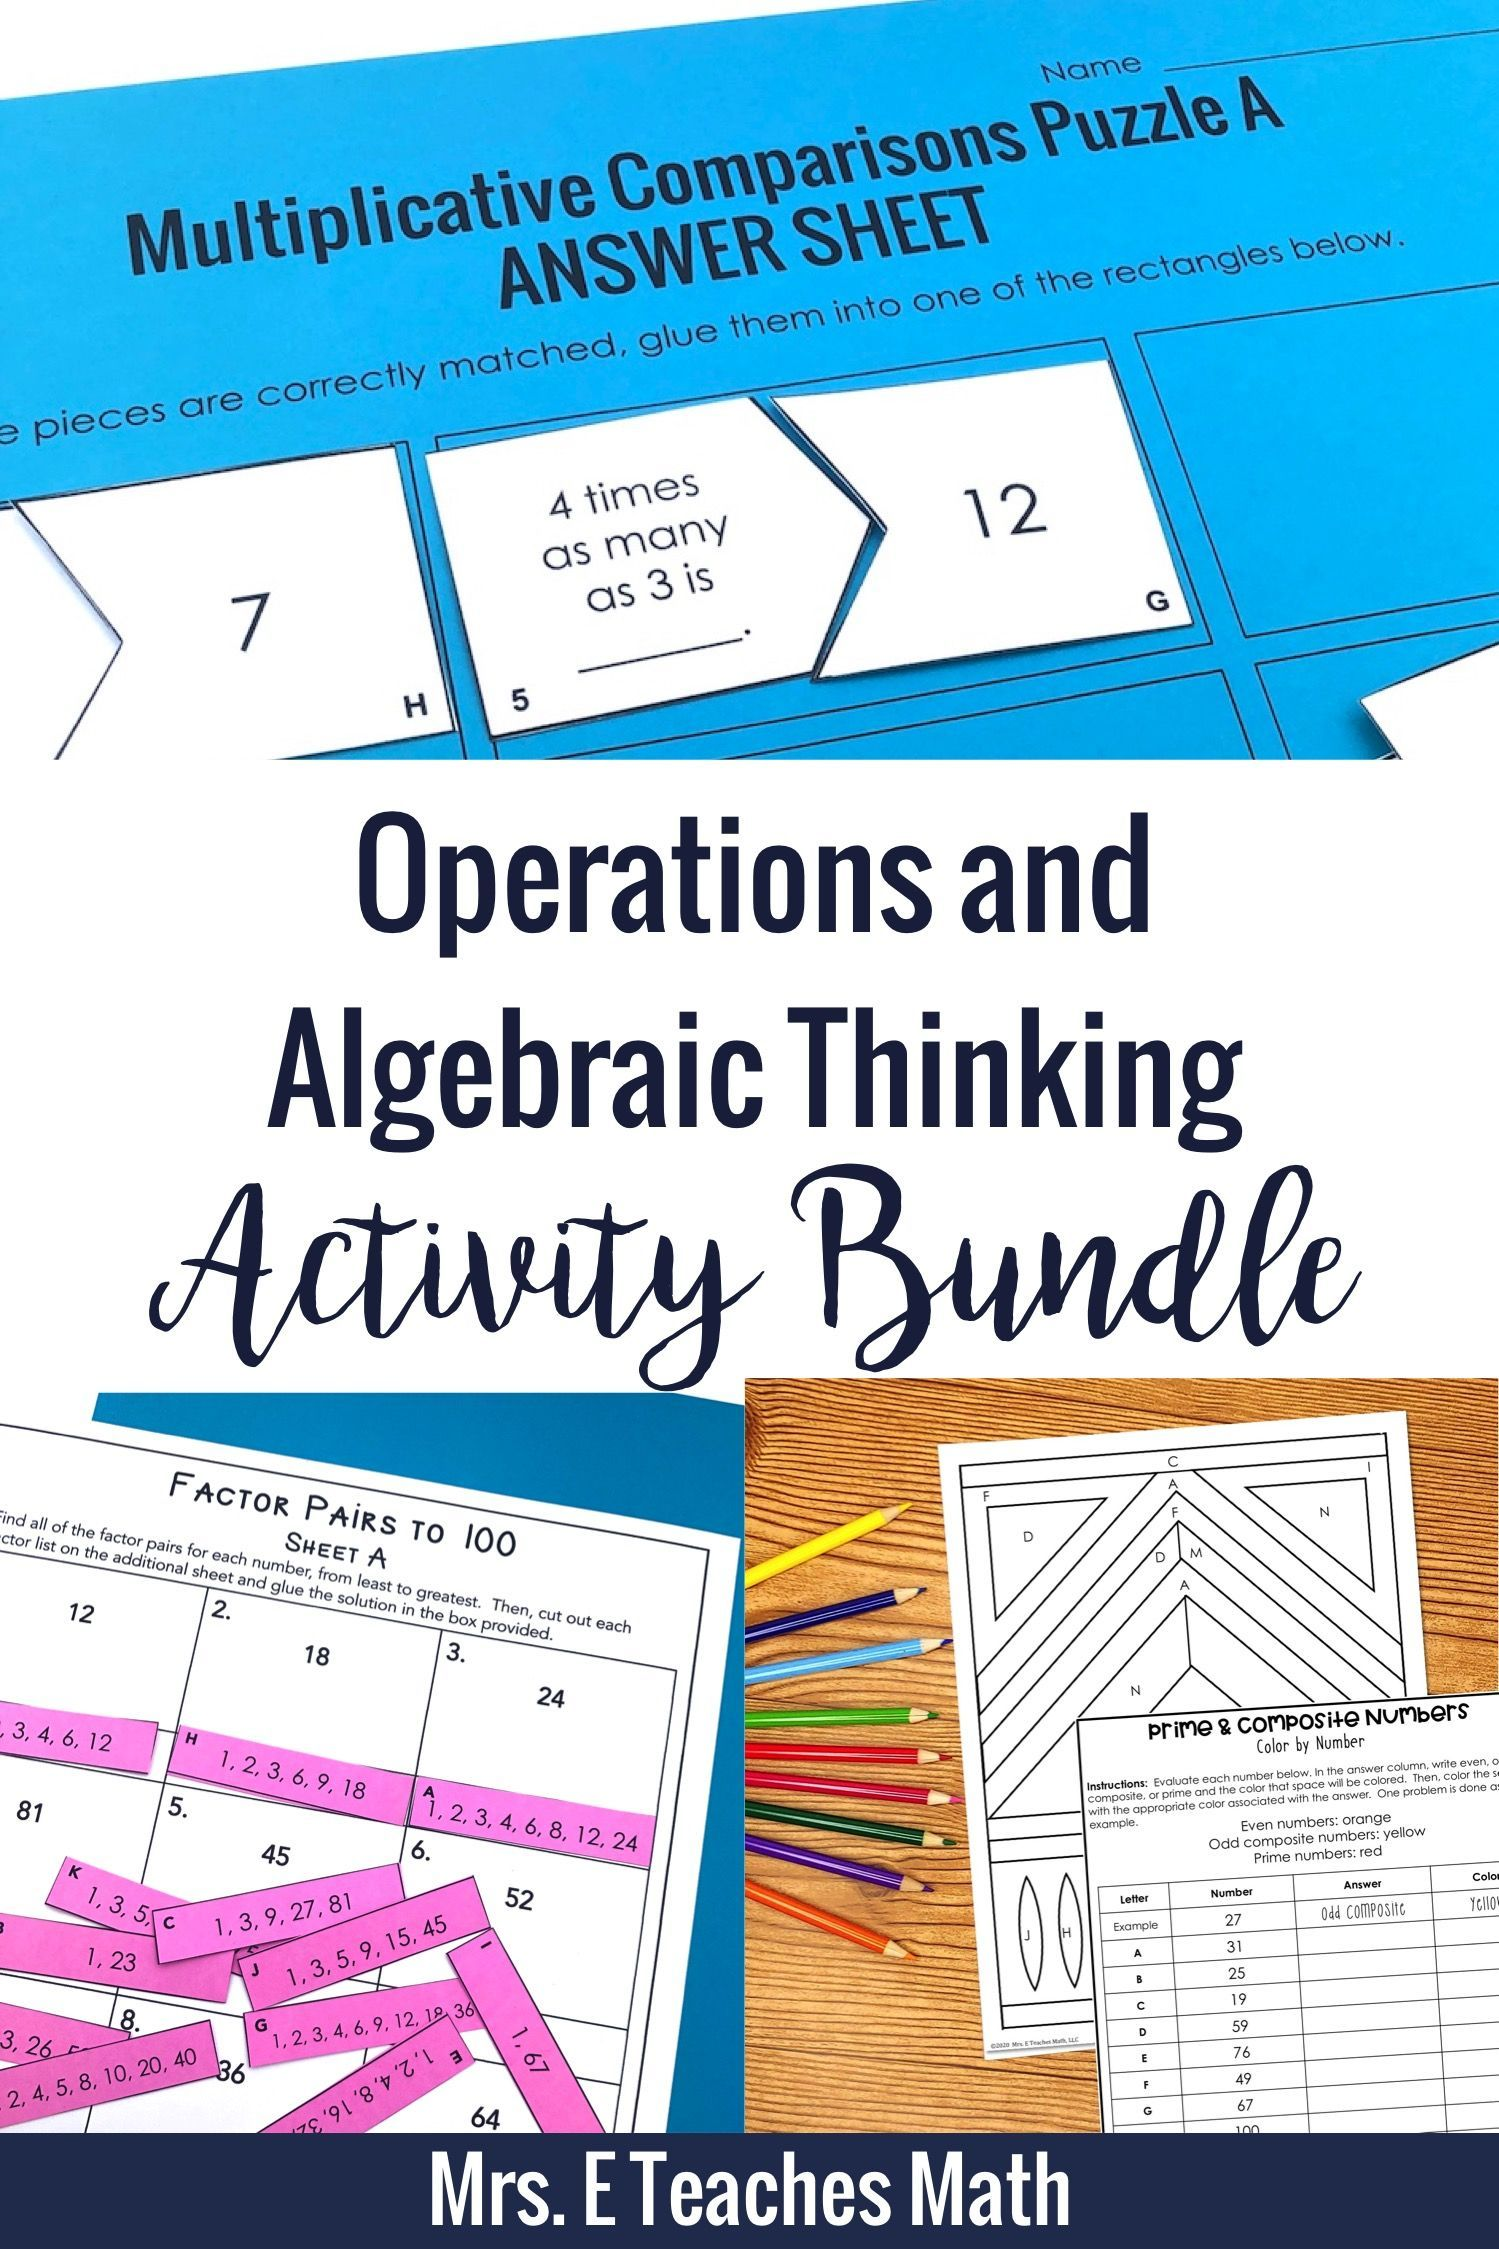 small resolution of Operations and Algebraic Thinking Activity Bundle 4.OA   Algebraic thinking